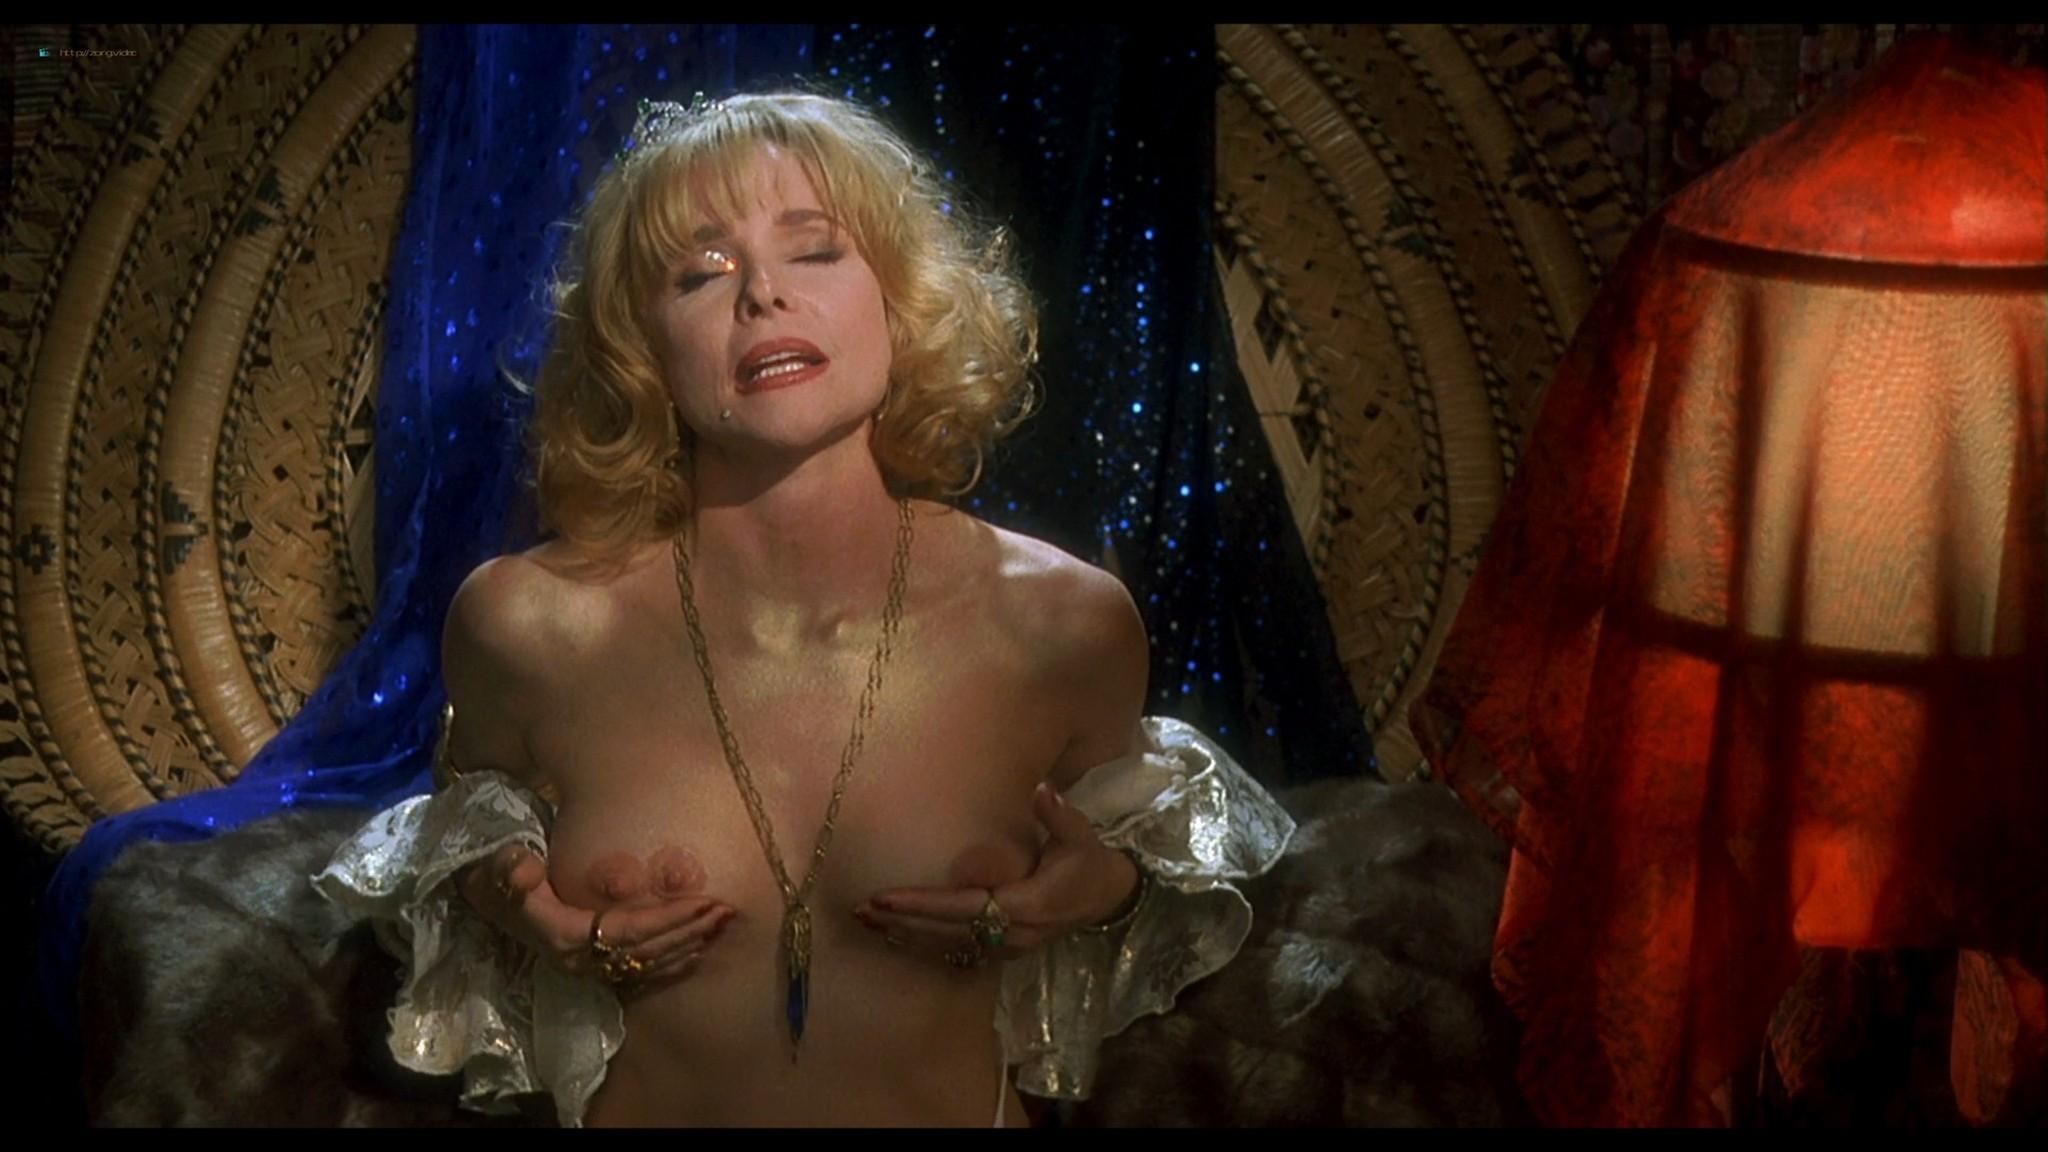 Joey Lauren Adams nude Priscilla Barnes nude topless - Mallrats (1995) HD 1080p BluRay (9)